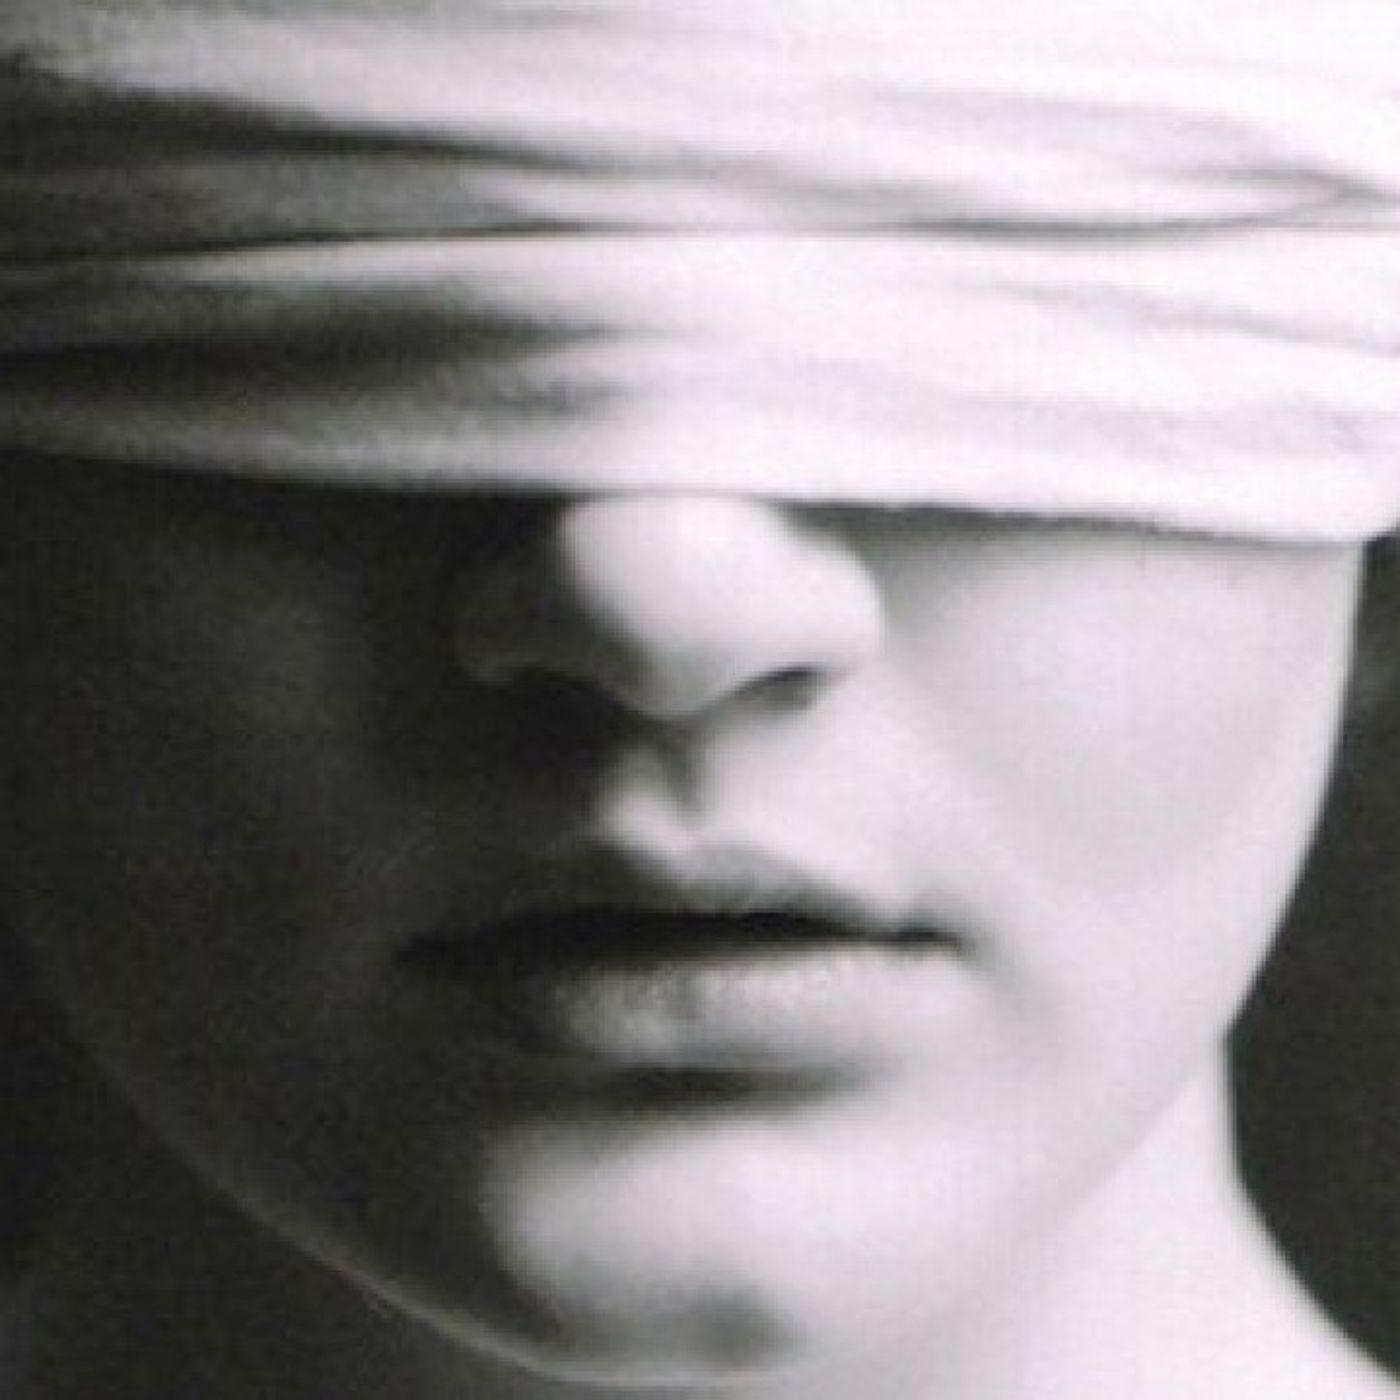 Ideological Blindness